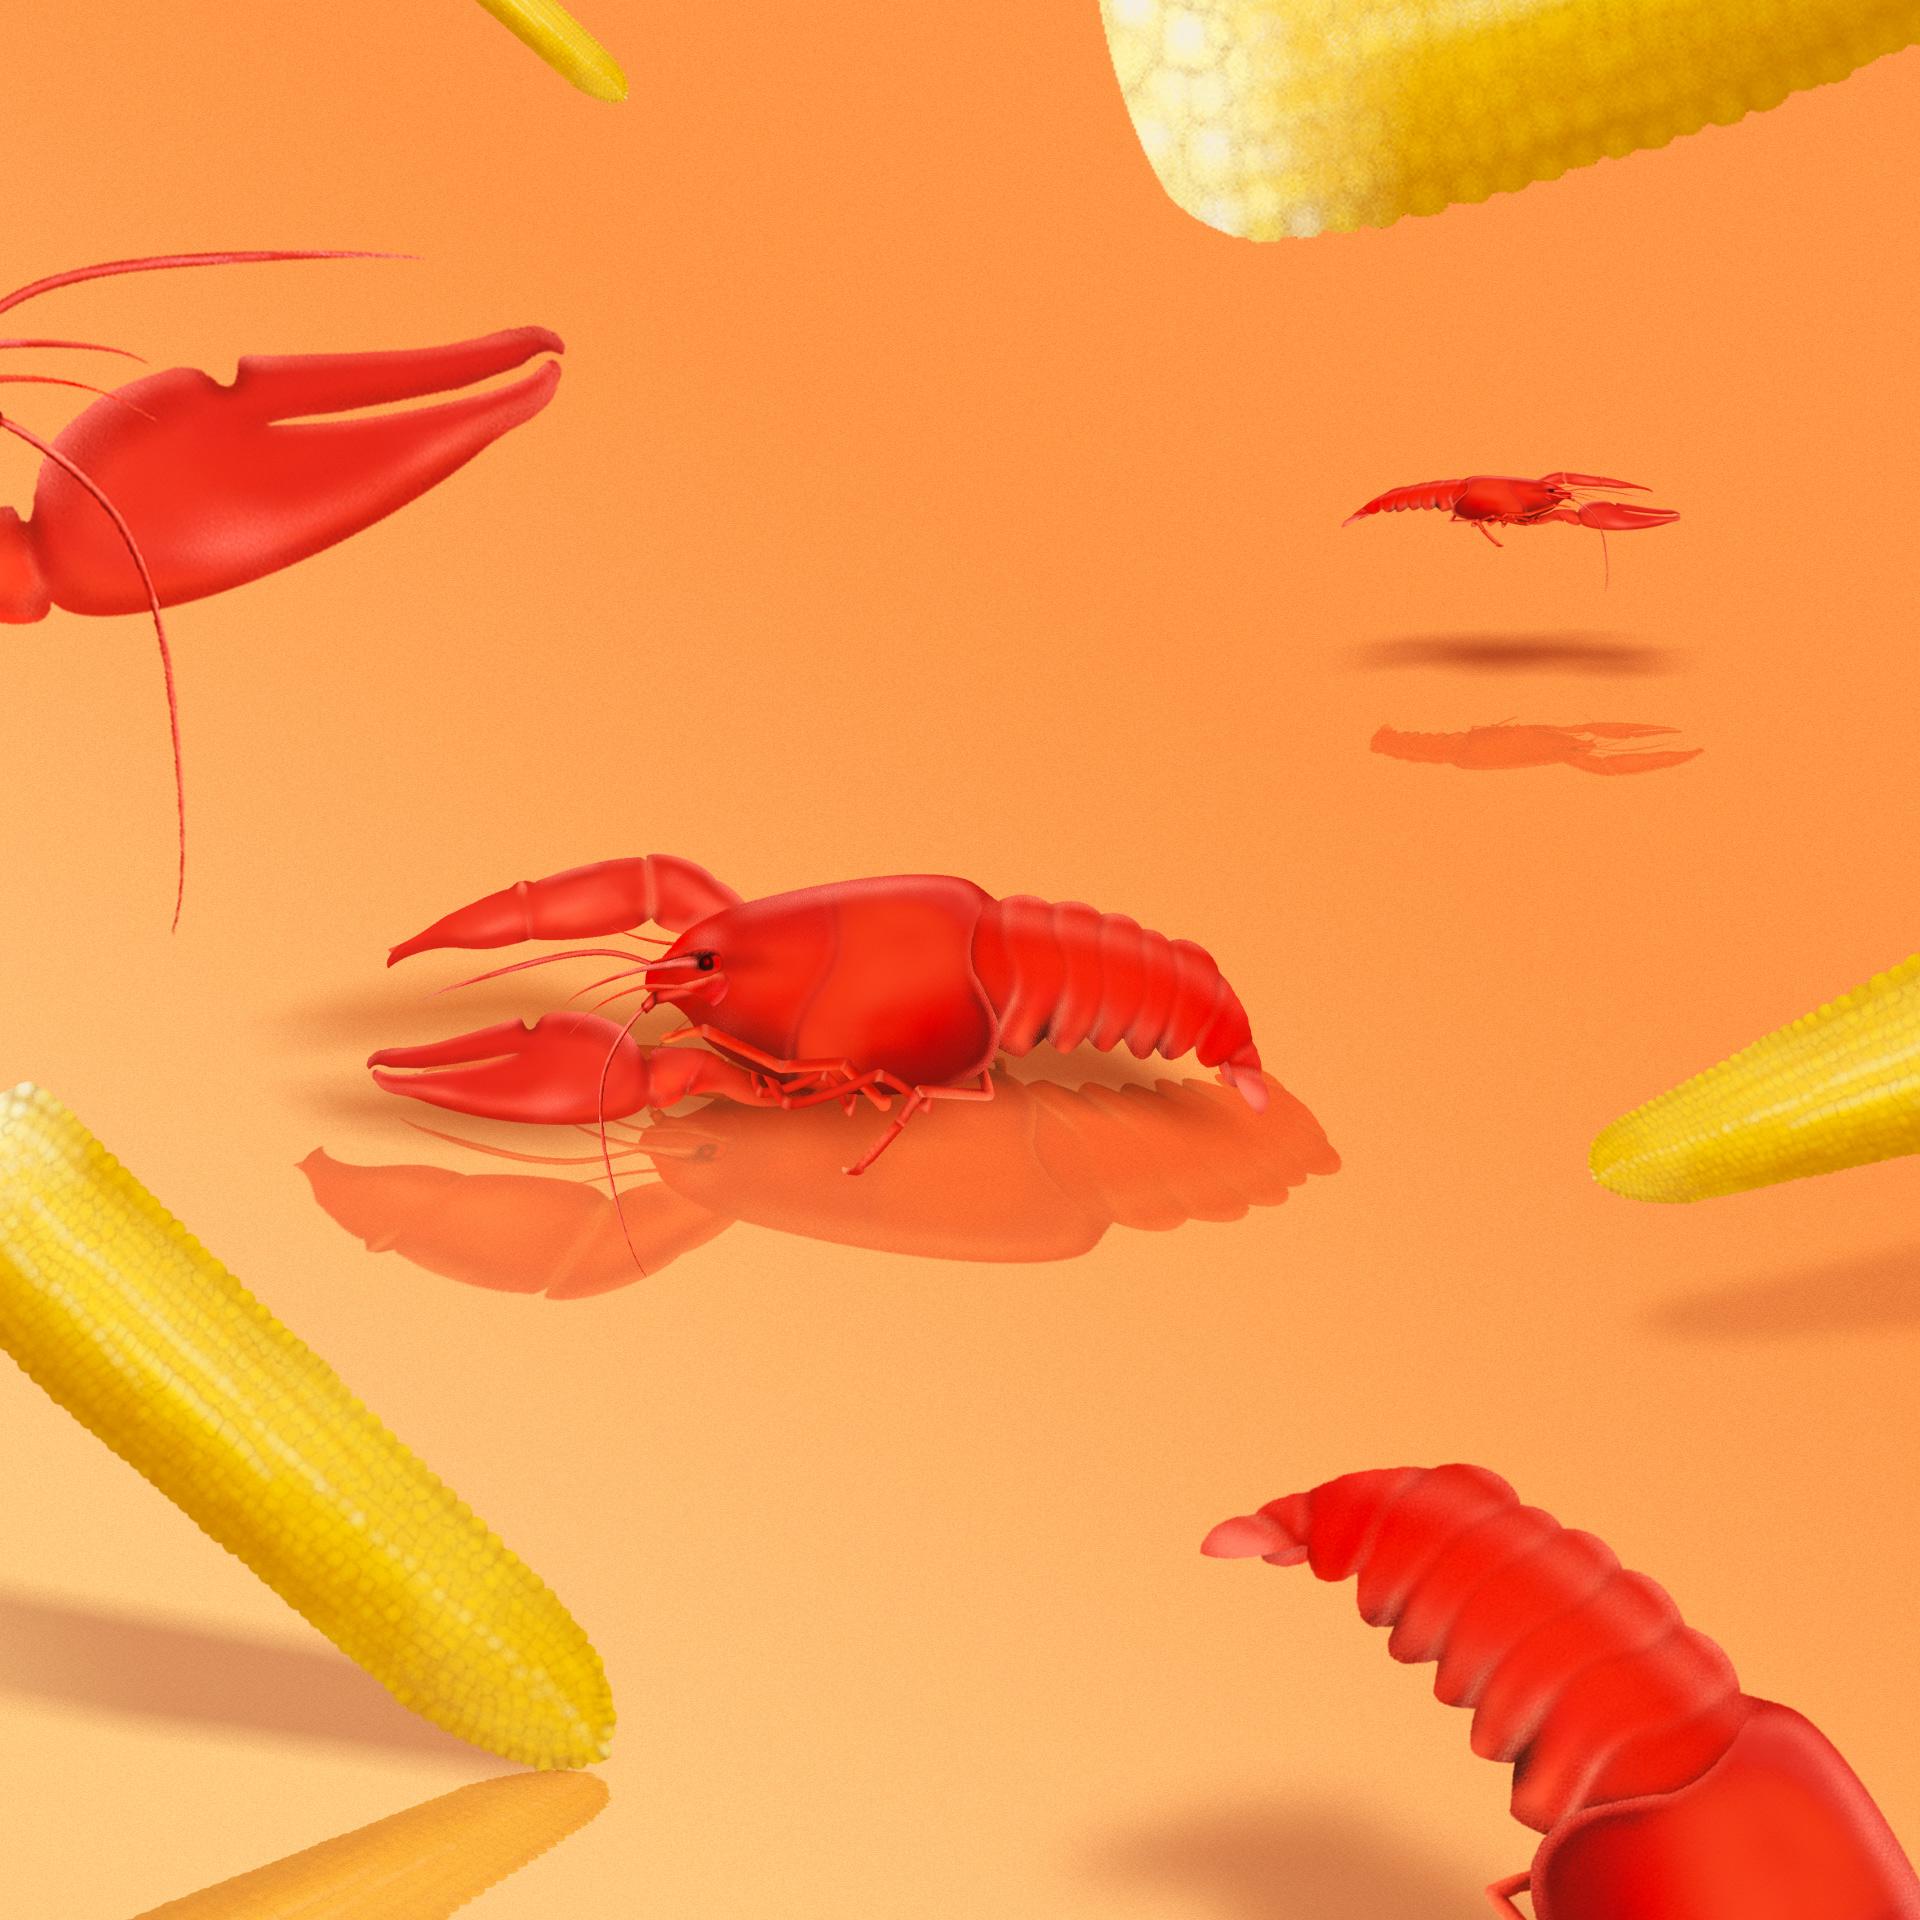 Crawfish-and-Corn-Illustration-WEB